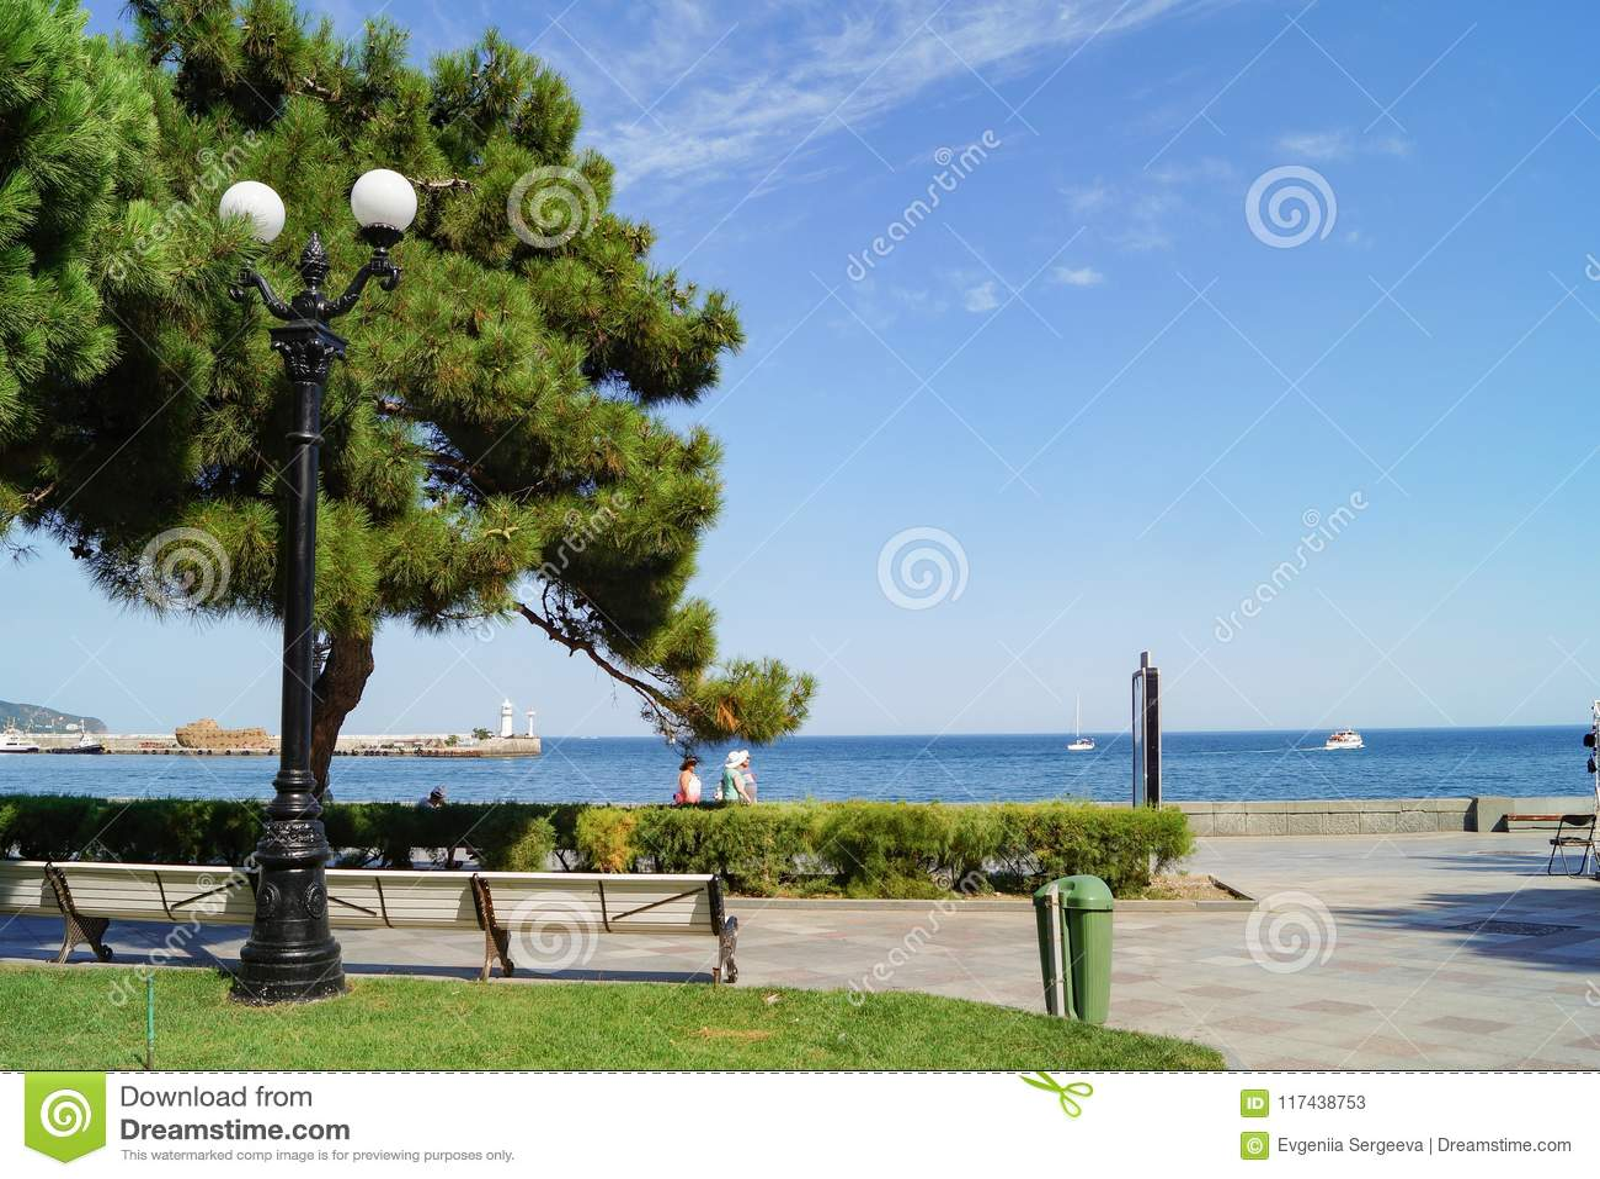 Embankment of Yalta, Crimea